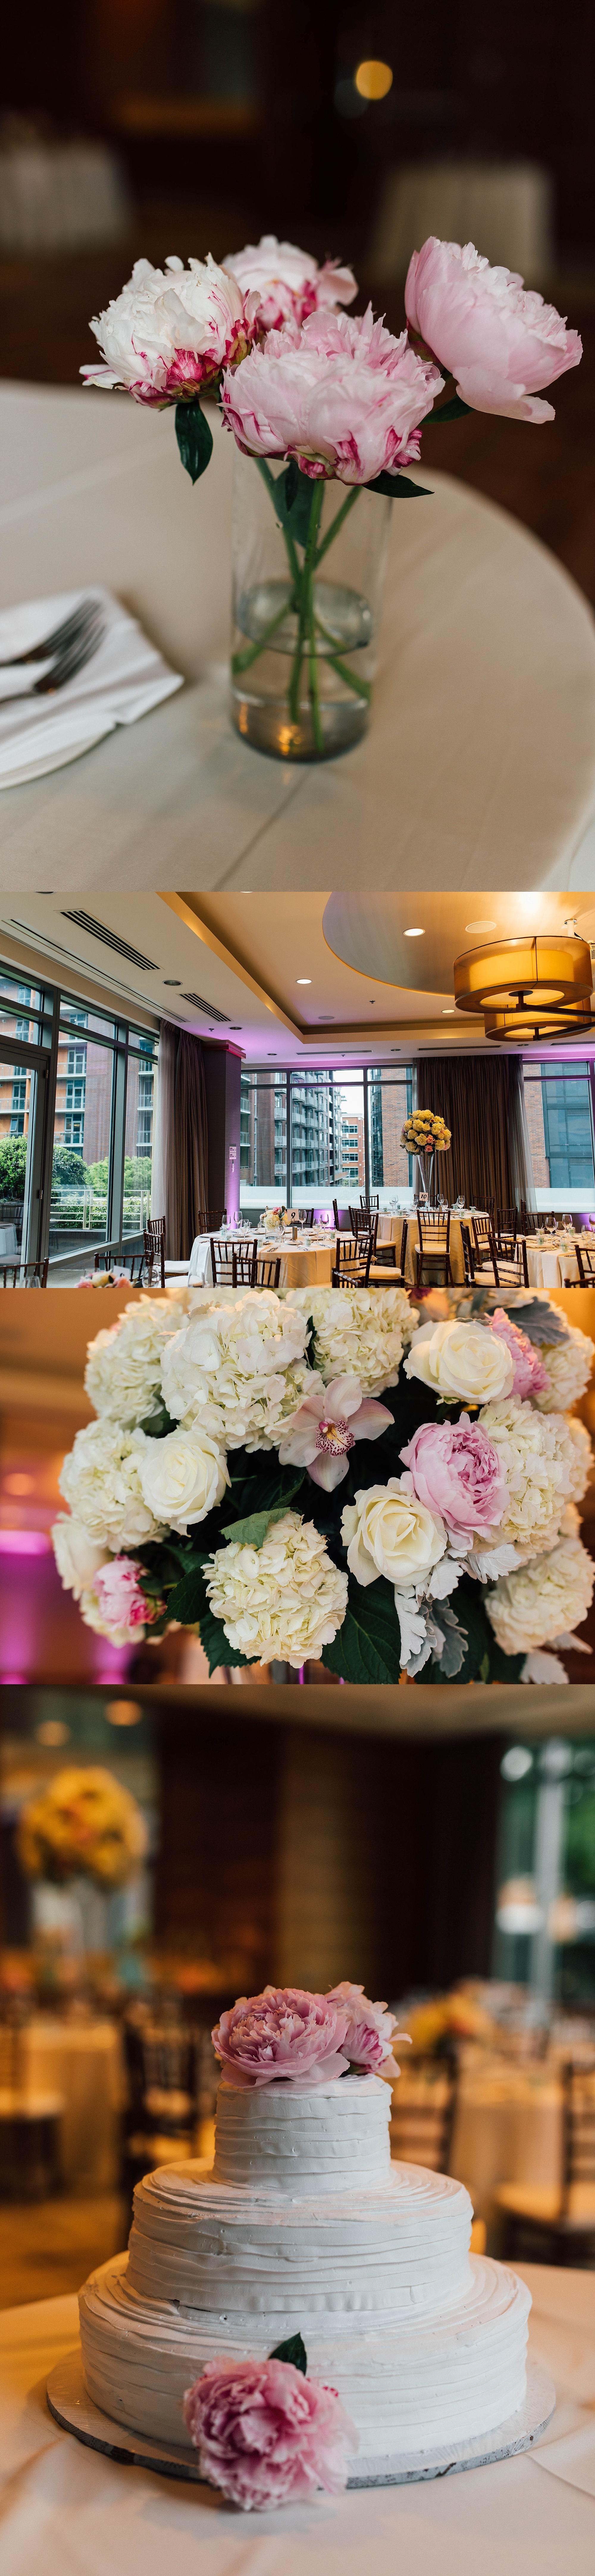 Seattle Pan Pacific Hotel Wedding | Kim + Cody | PNW Wedding Photographer-17.jpg